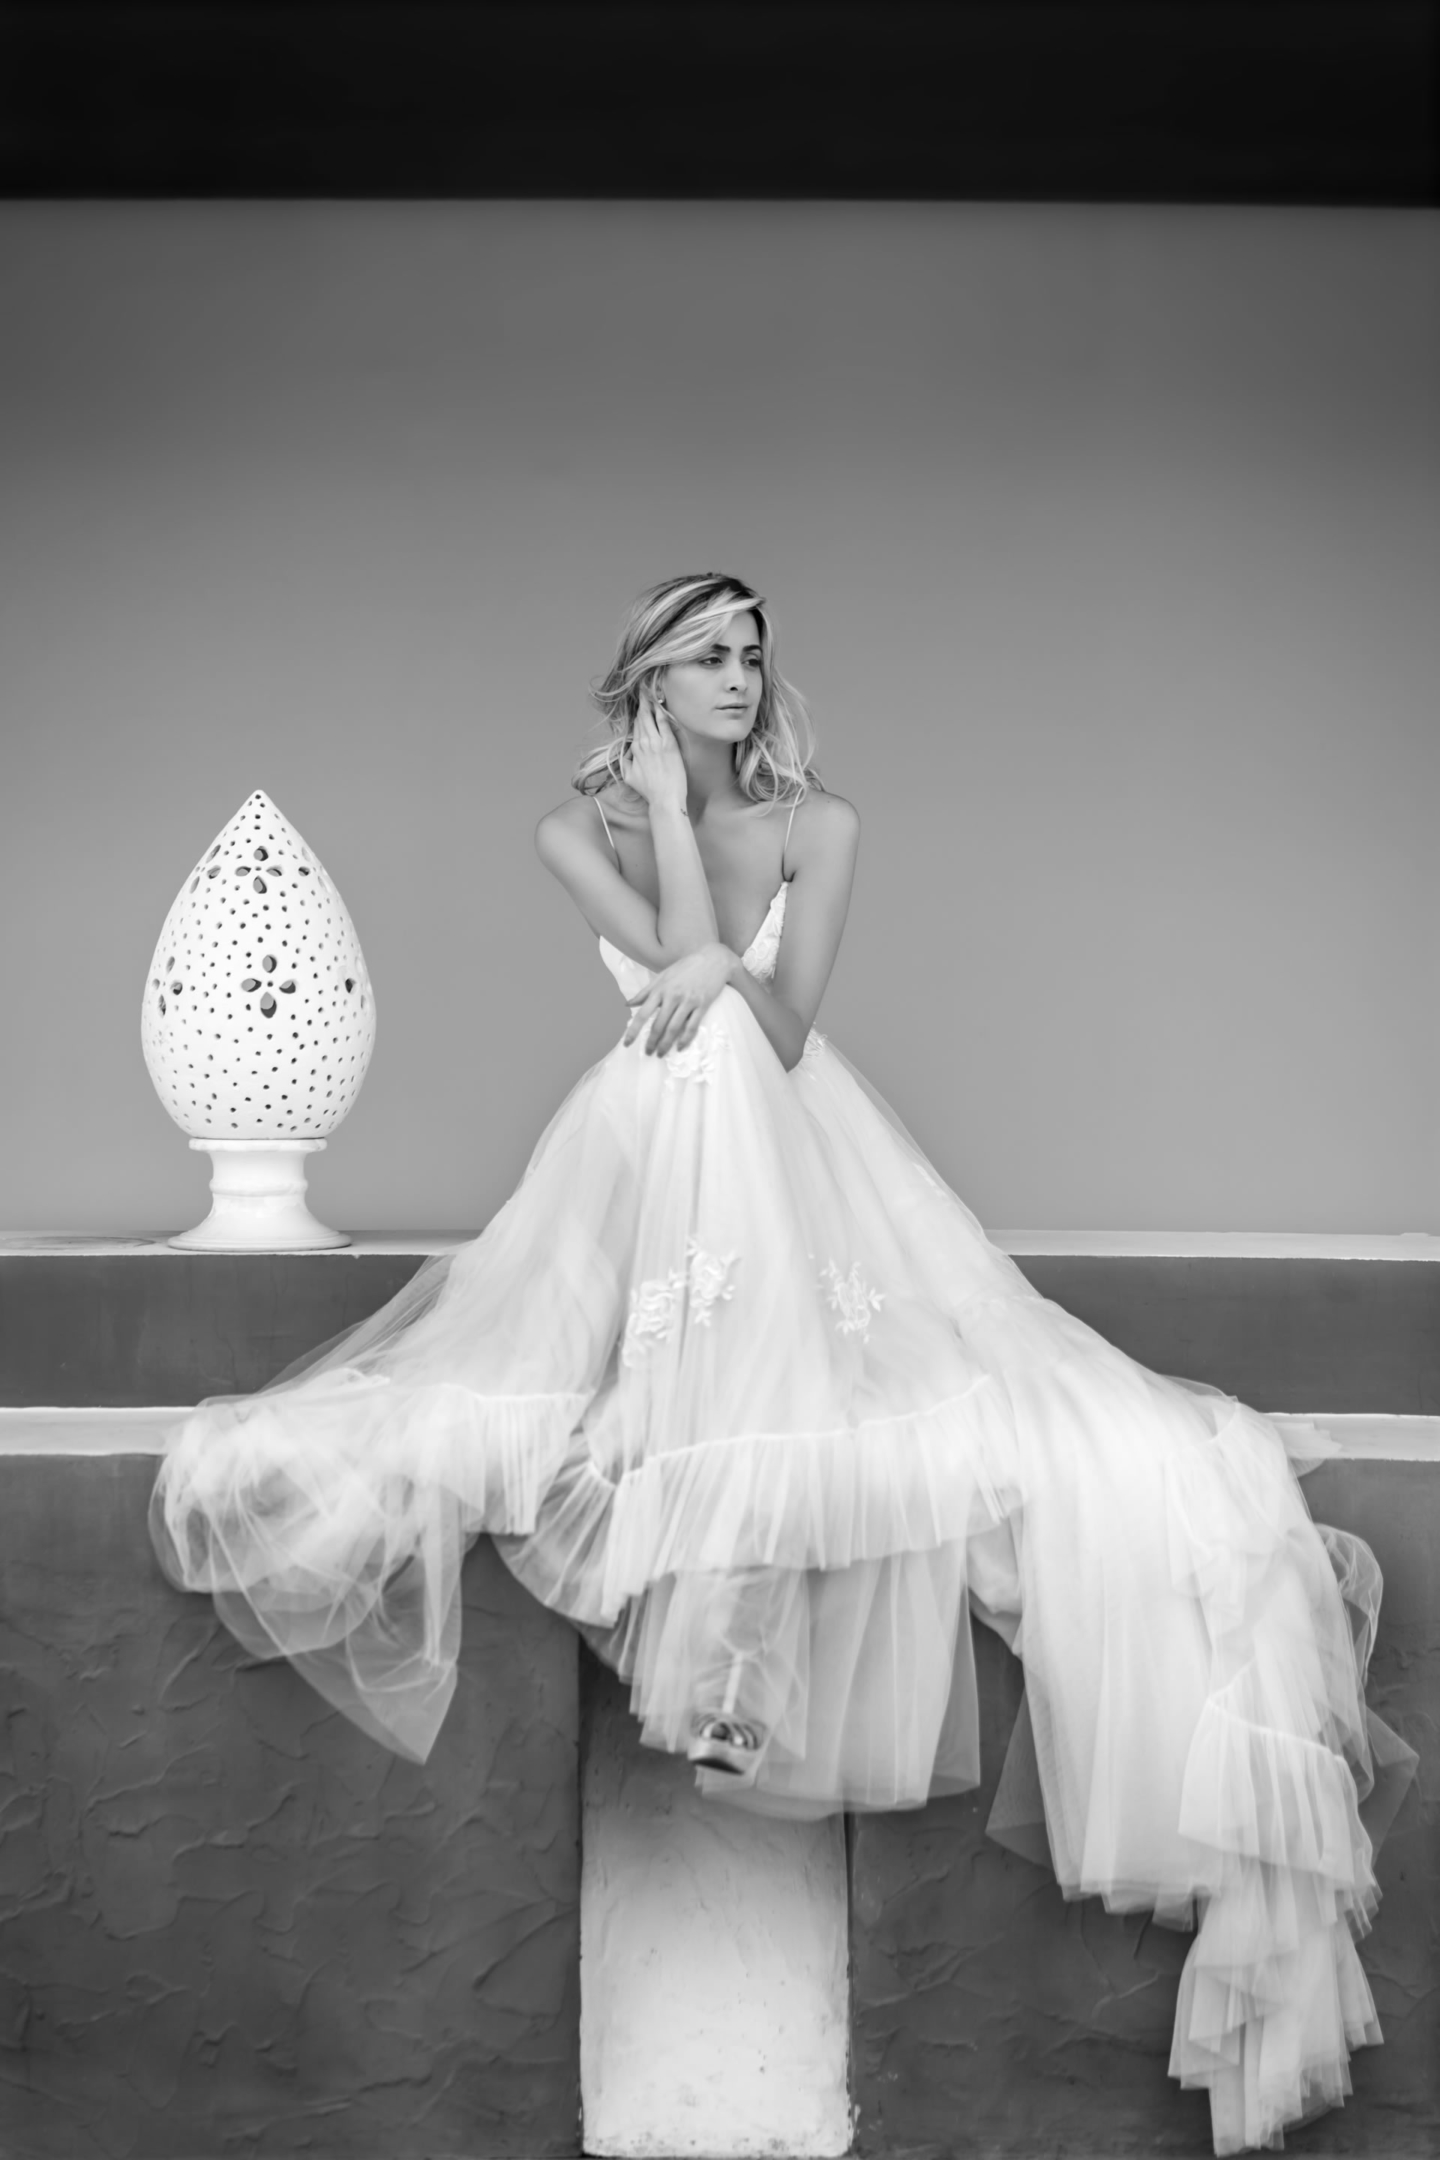 Bride portrait: when beauty comes from happiness :: Bride's portrait: when beauty comes from happiness :: Luxury wedding photography - 34 :: Bride portrait: when beauty comes from happiness